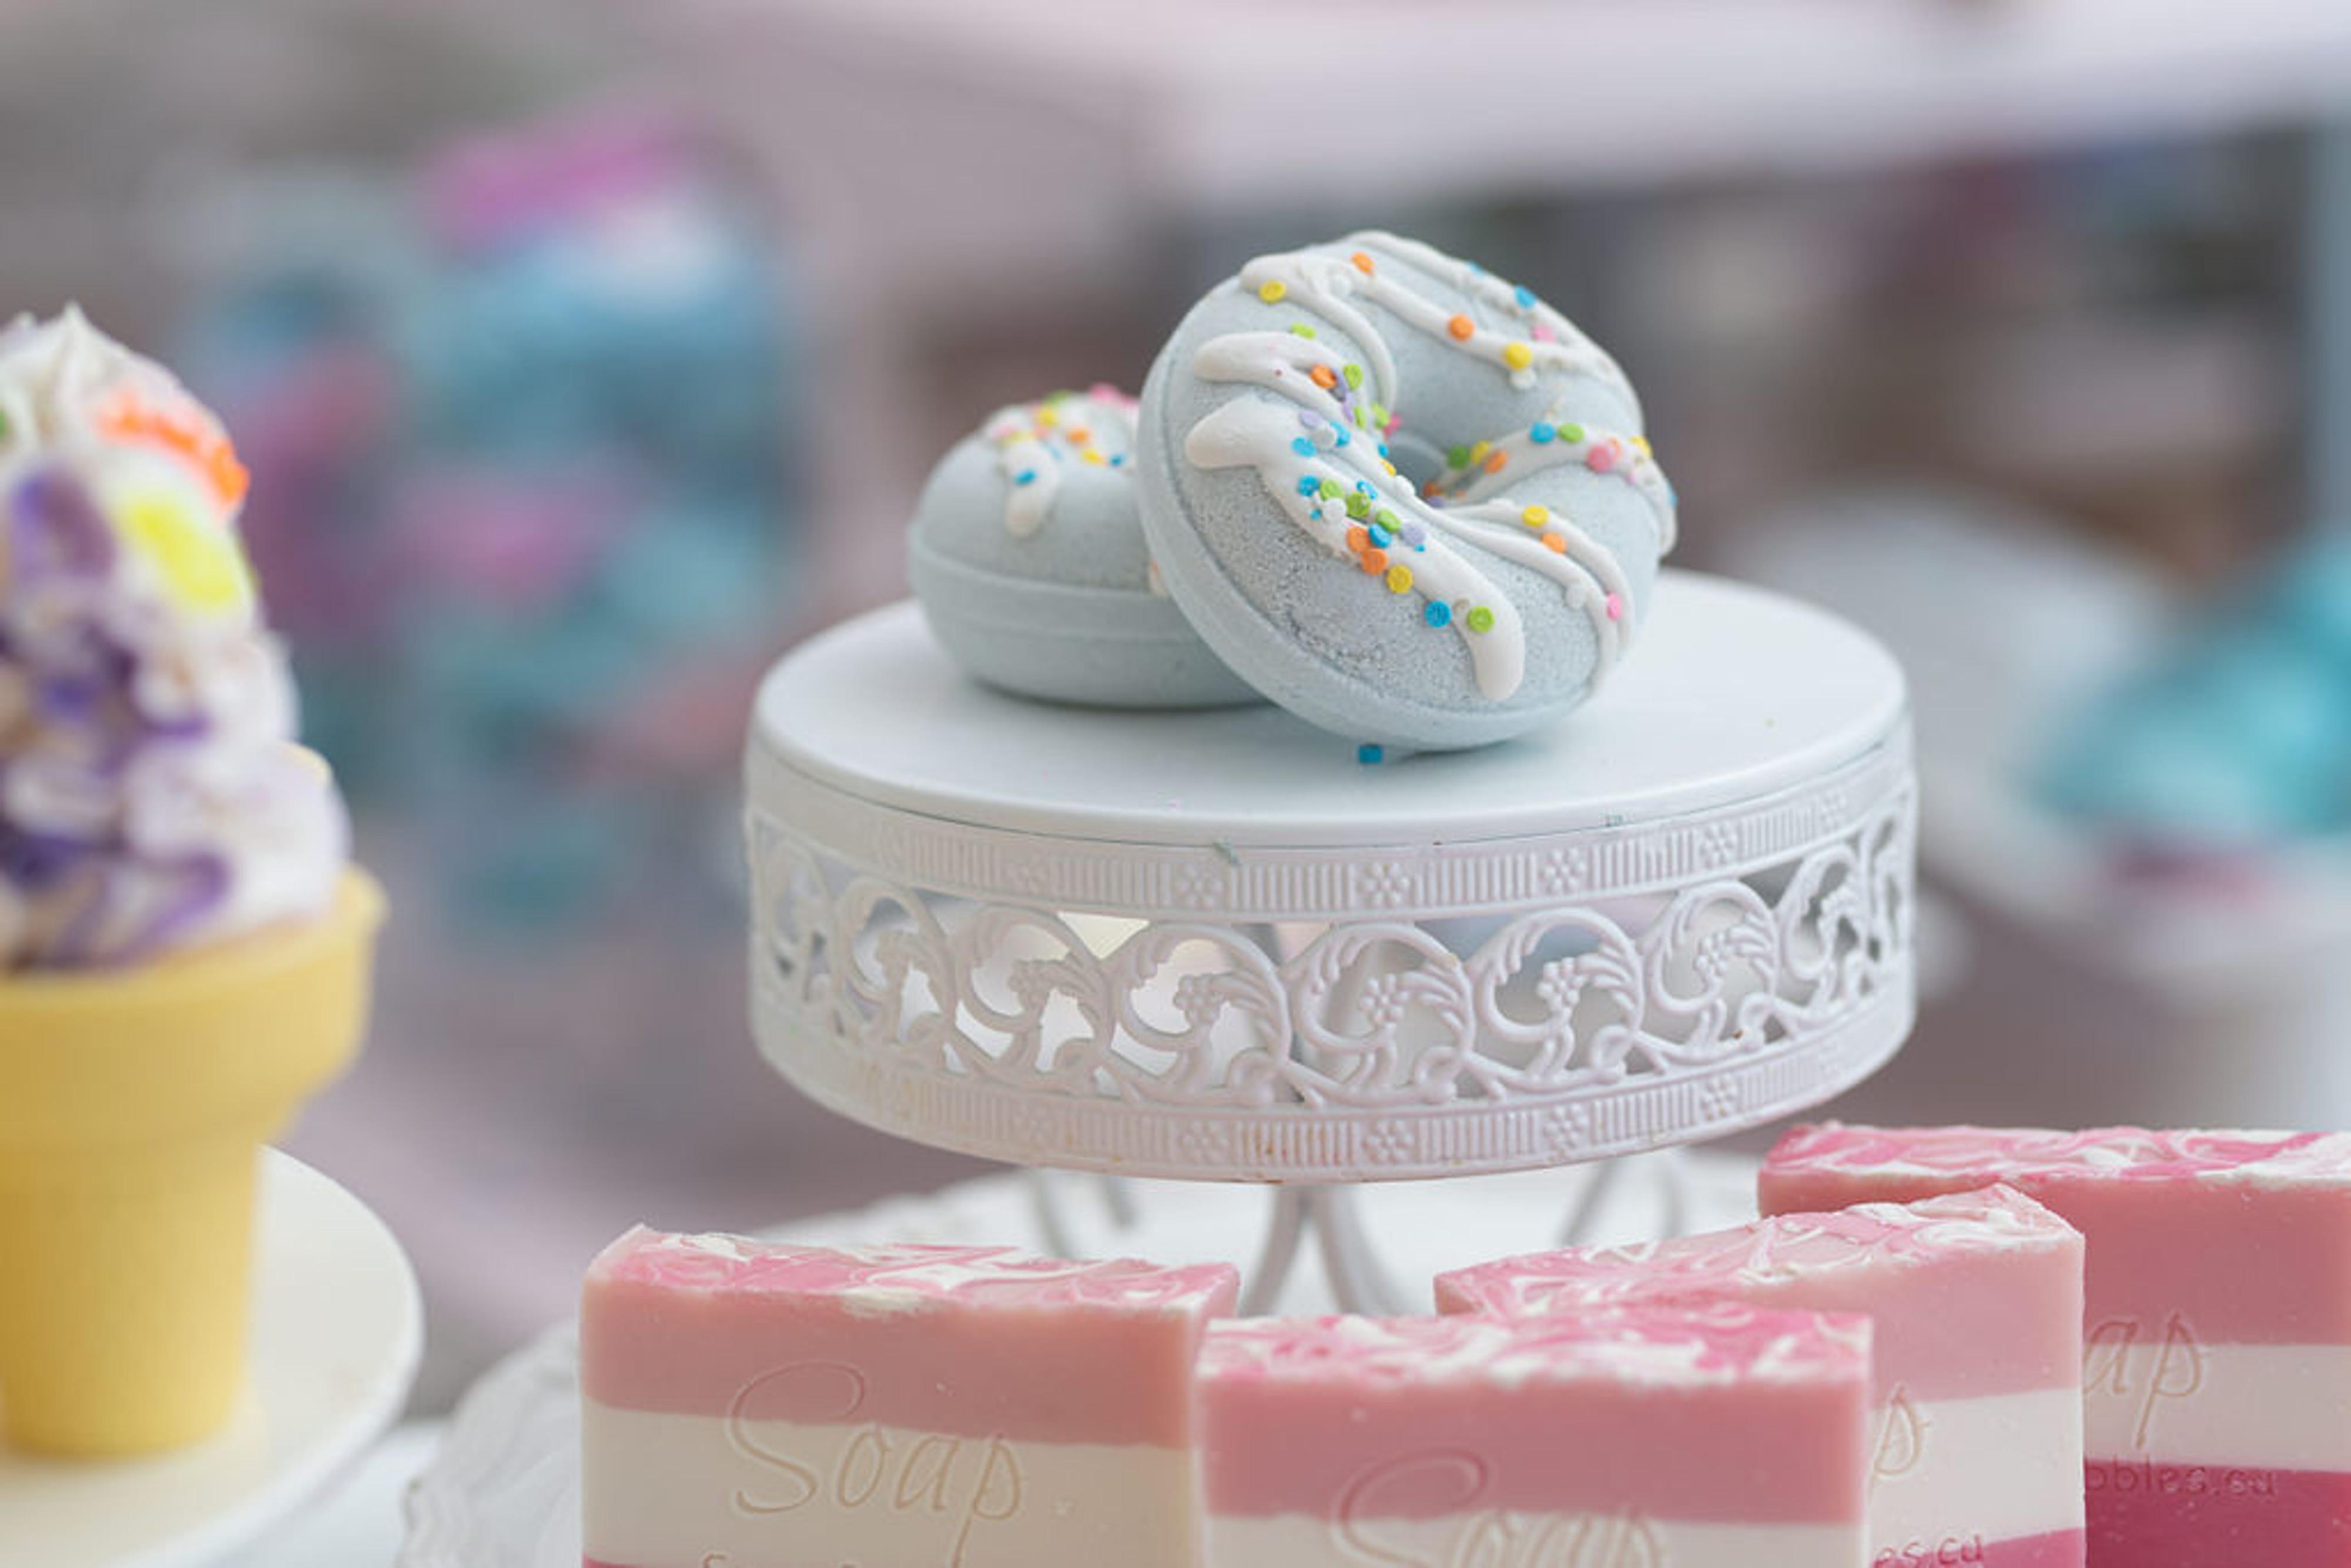 Blueberry Whippity Dippity Bath Bomb (Donut)